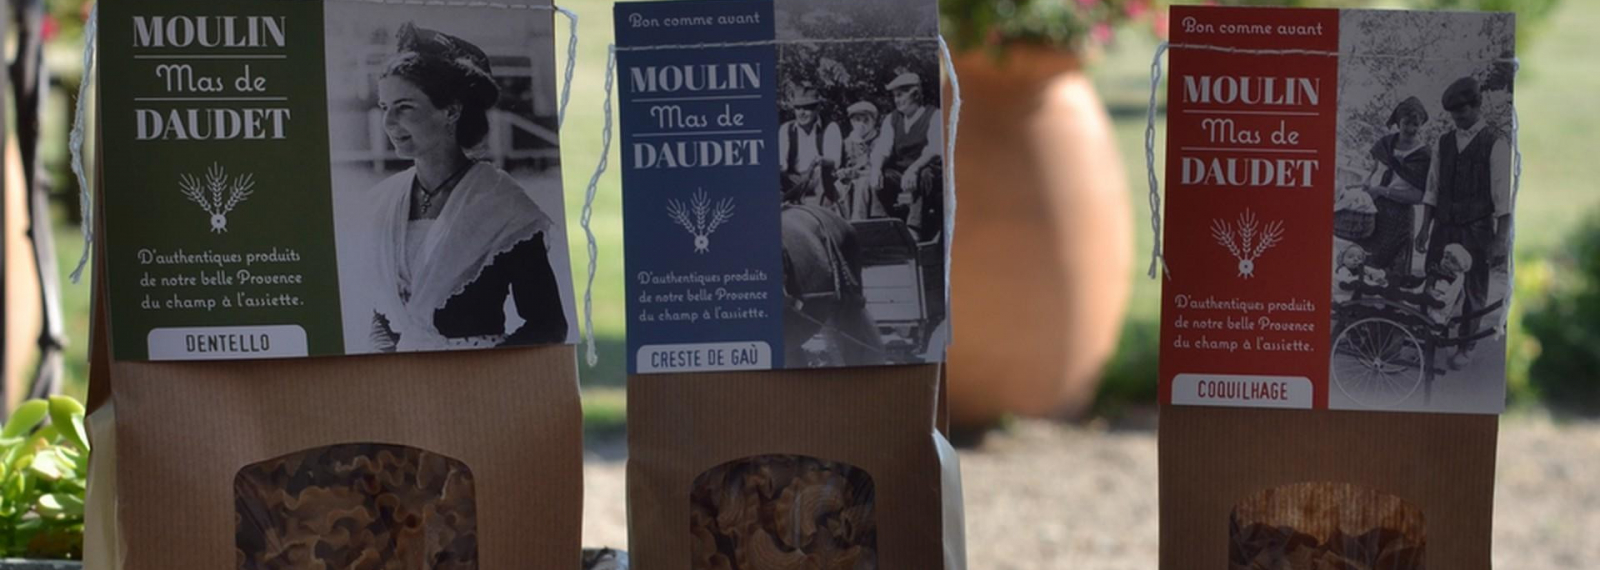 Moulin Mas de Daudet